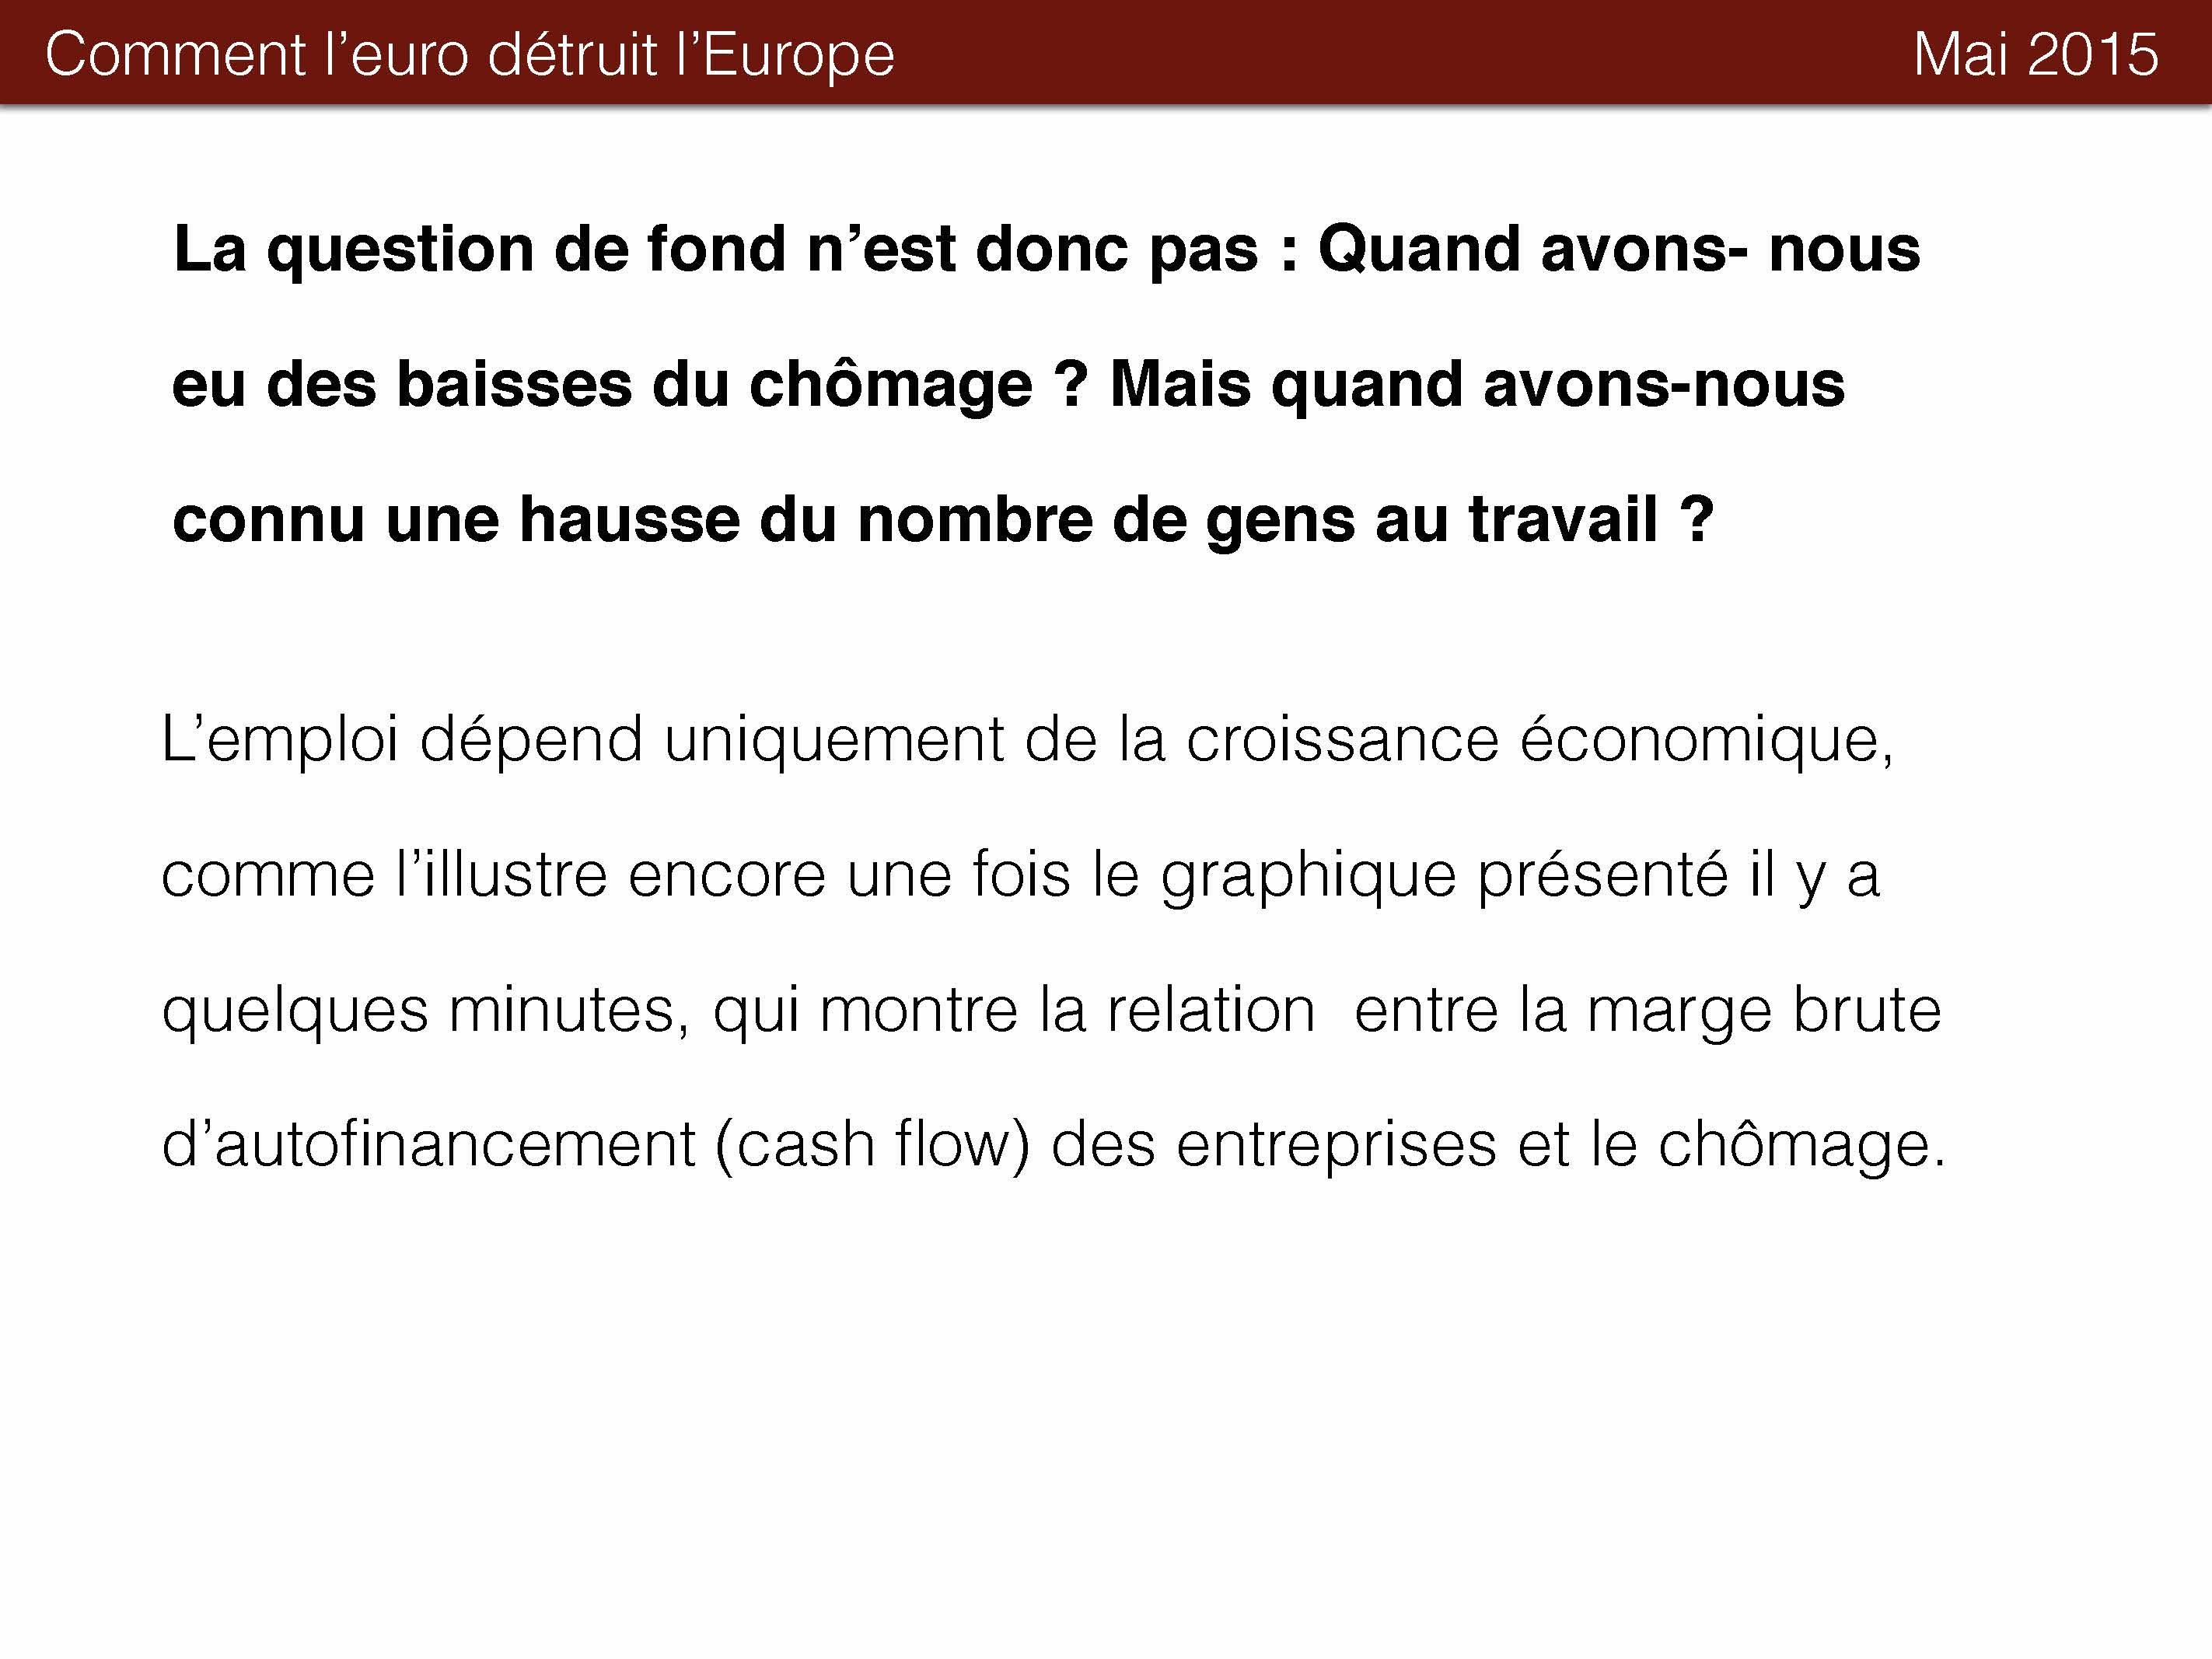 EUro_Page_22